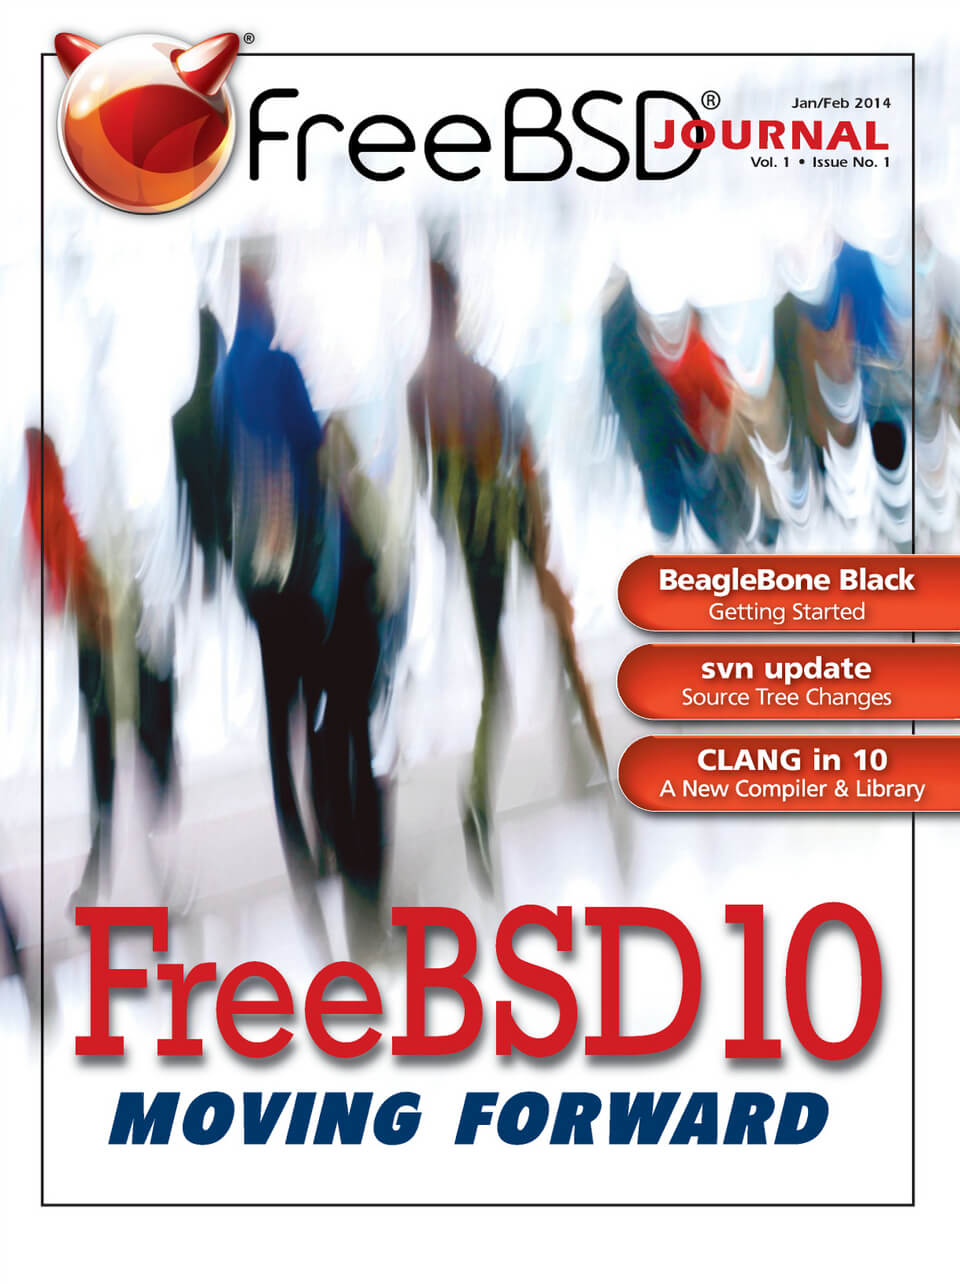 FreeBSD-10